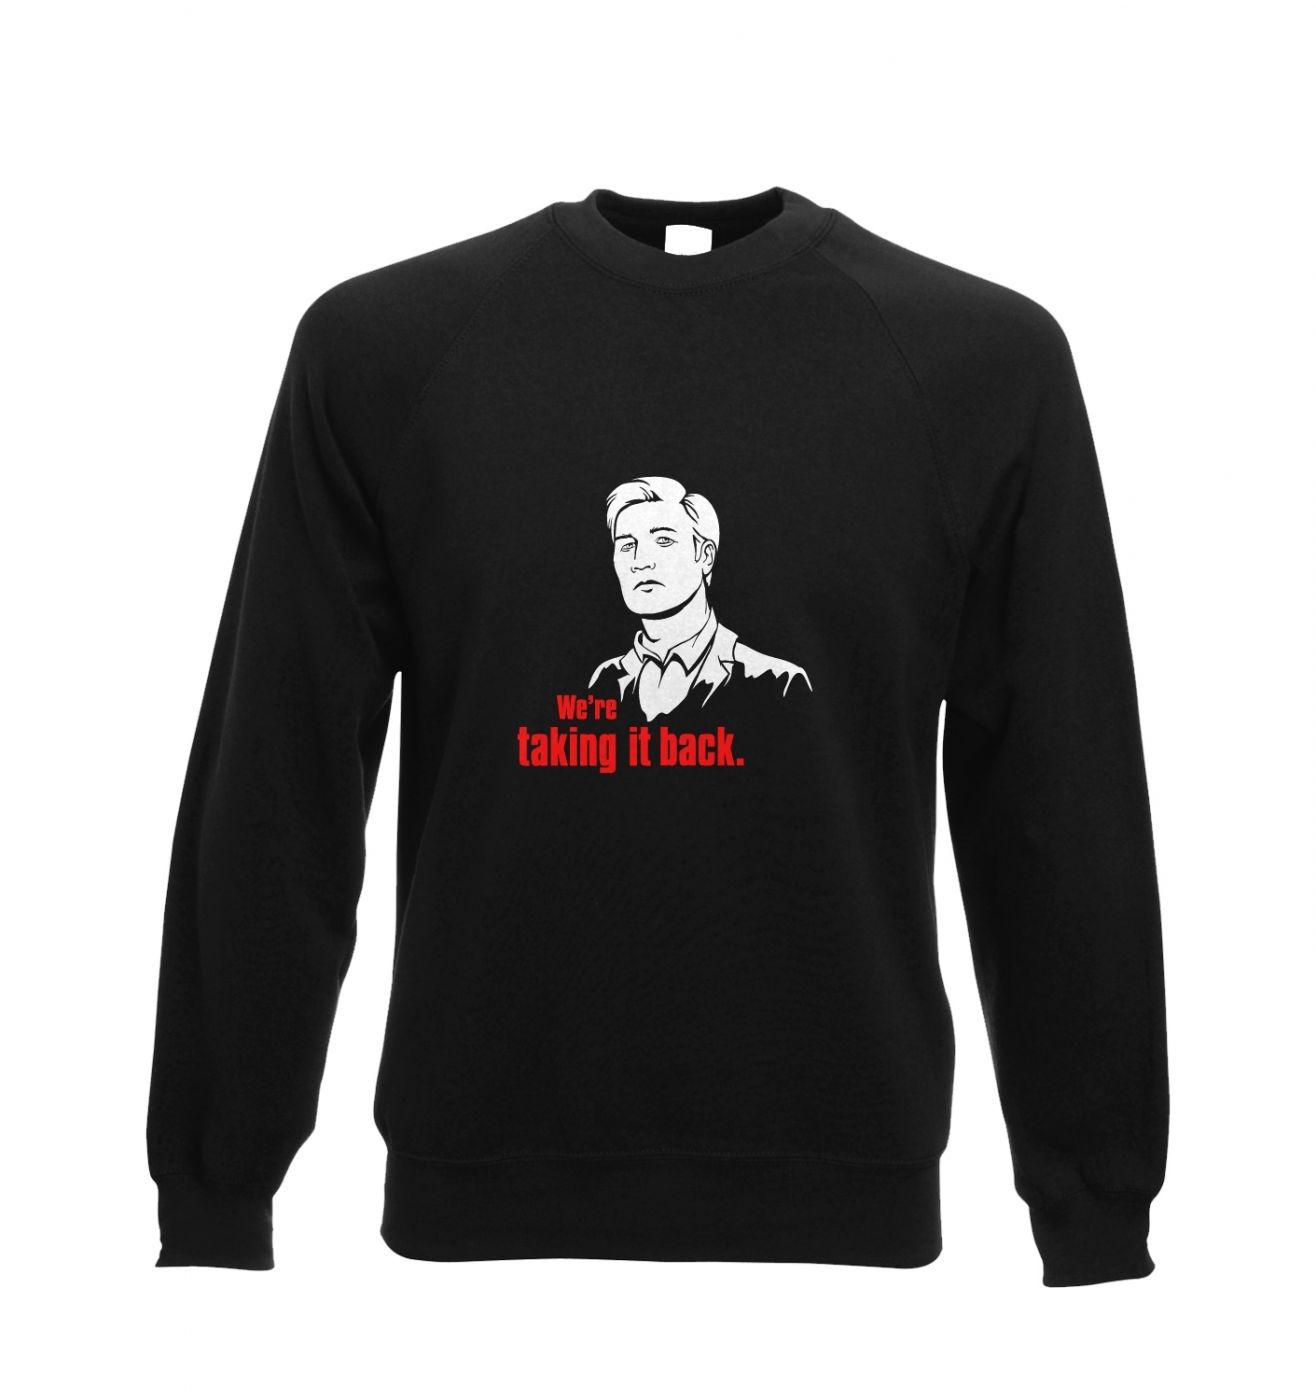 We're taking it back Adult Crewneck Sweatshirt